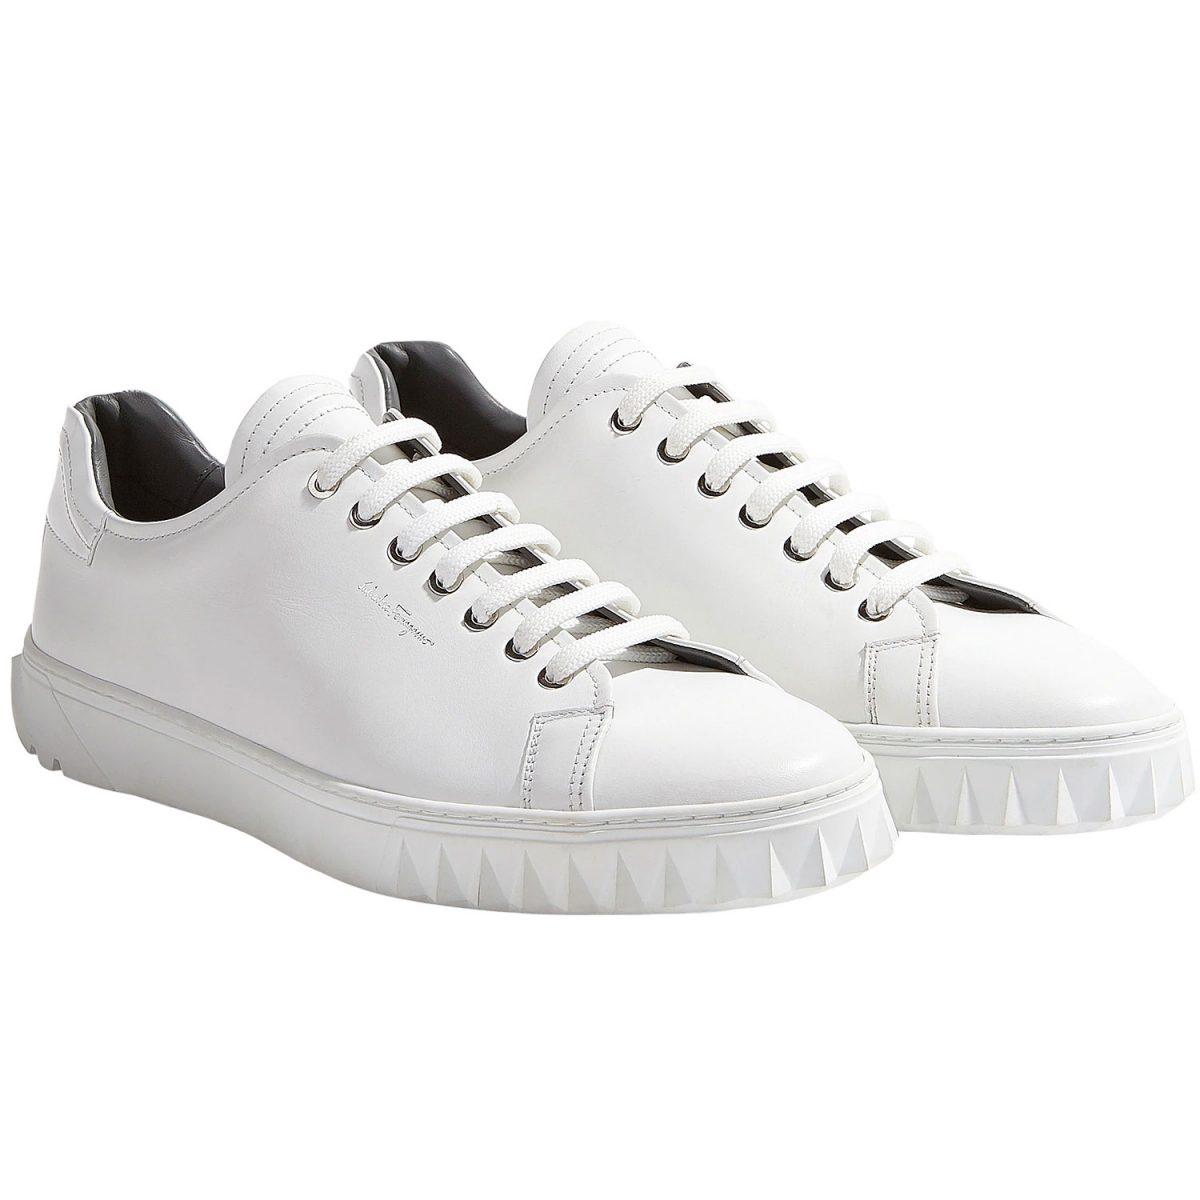 Levy's white Ferragamo sneakers